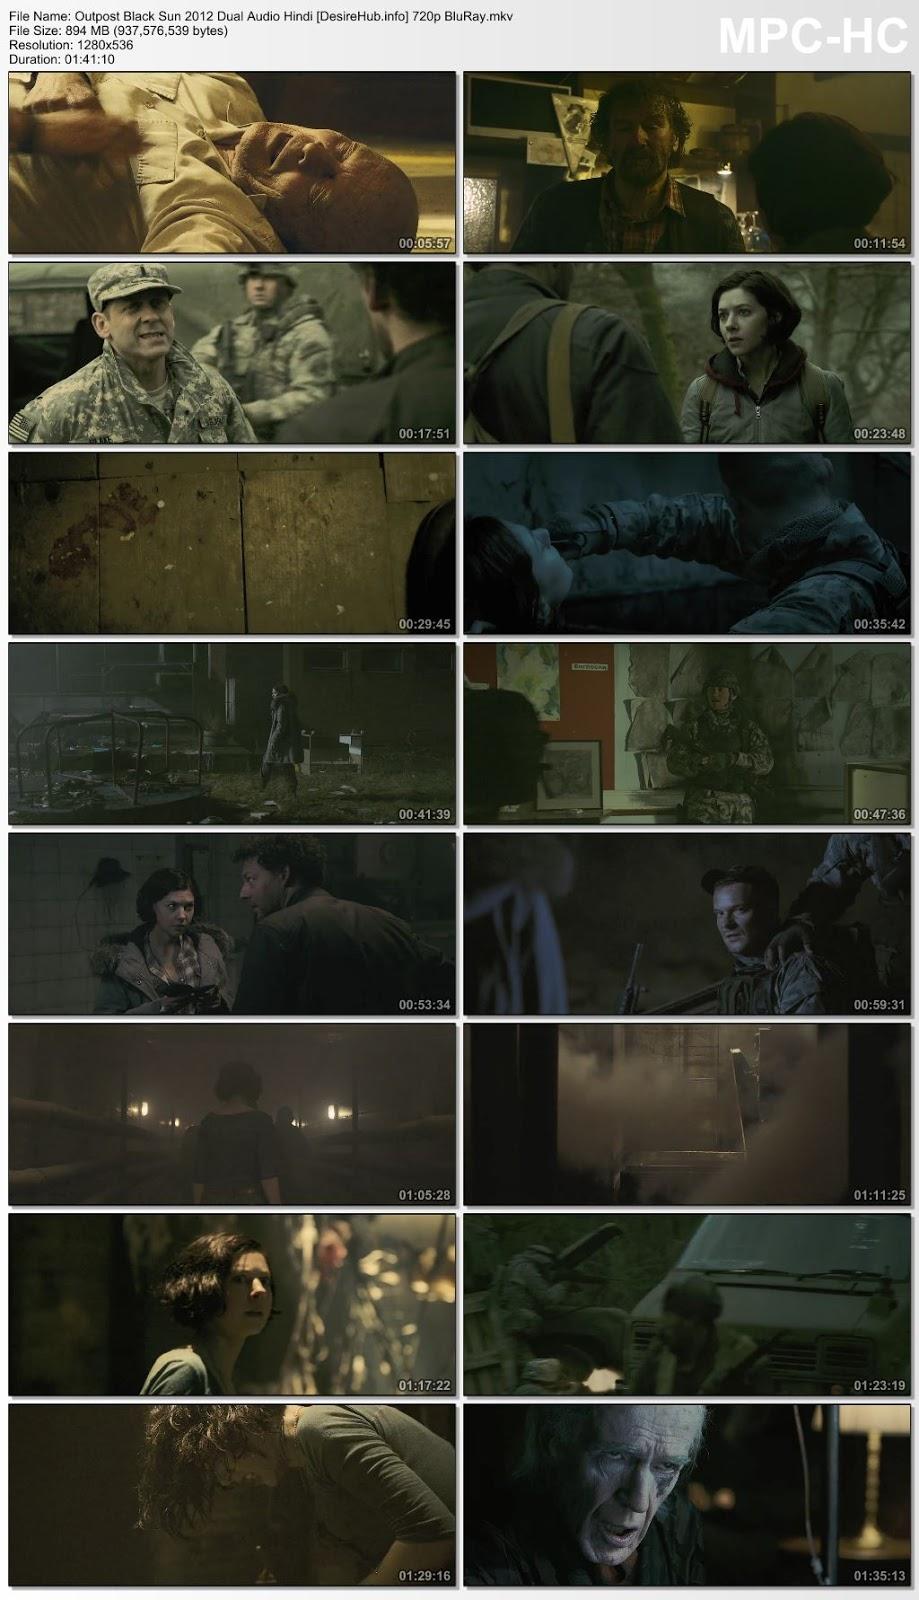 Outpost: Black Sun 2012 Dual Audio Hindi 480p BluRay 300MB Desirehub